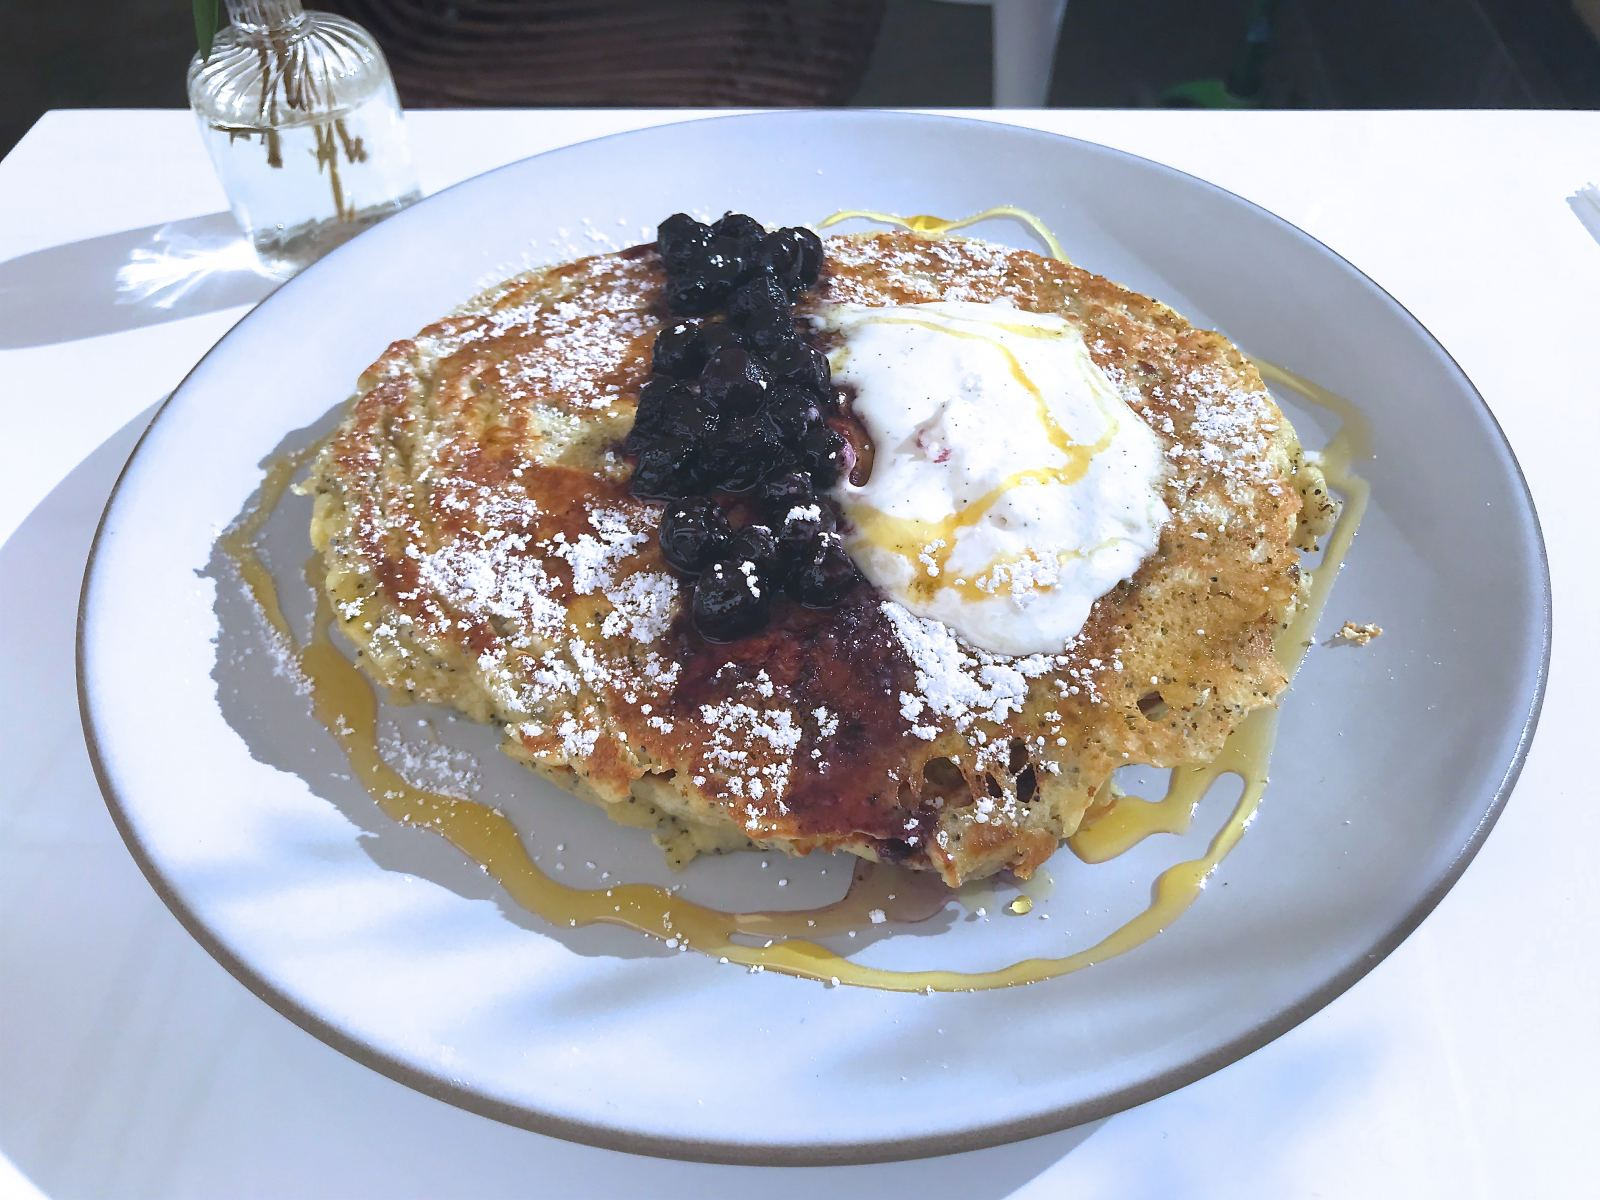 Lemon & poppy seed pancakes at Pollen